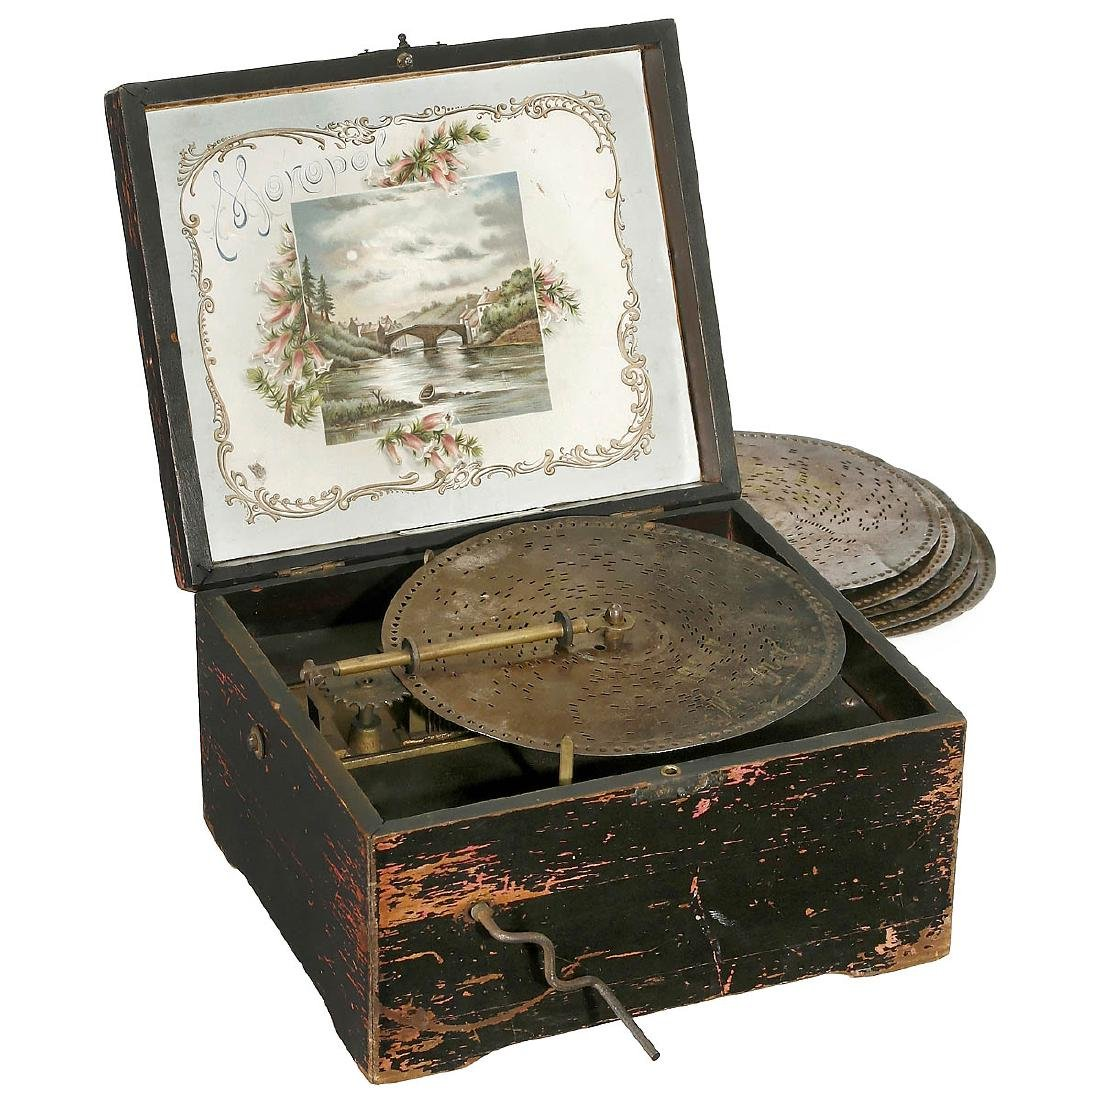 Monopol Manivelle Disc Musical Box, c. 1900